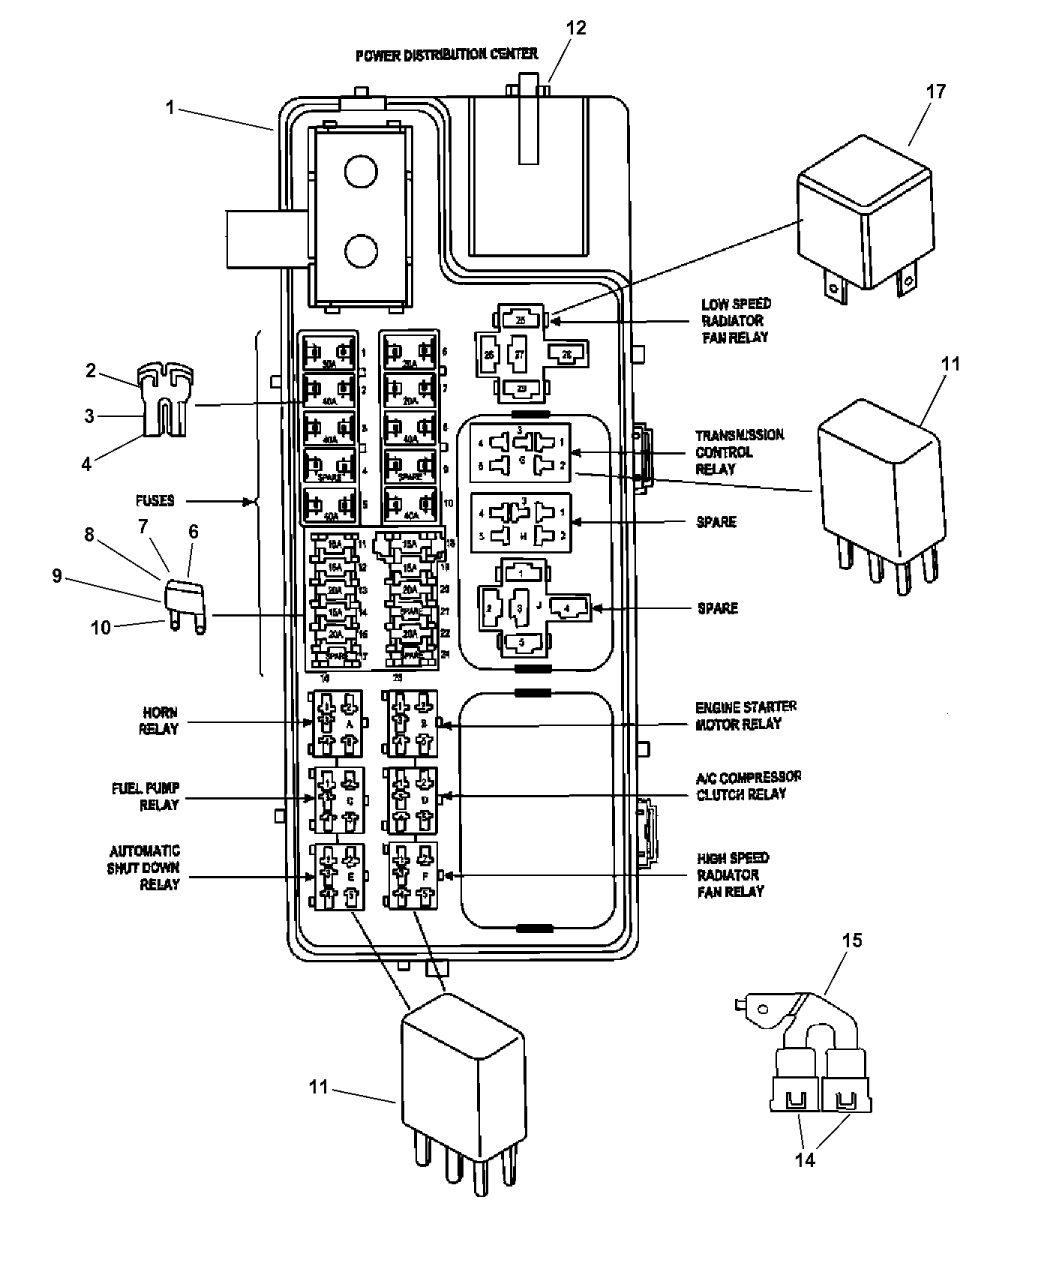 Radiator for 2007 pt cruiser wiring diagram wiring library 2007 pt cruiser fan wiring diagram starter wiring diagram pt cruiser wire diagram 2007 chrysler pt cruiser relays, fuses power distribution center